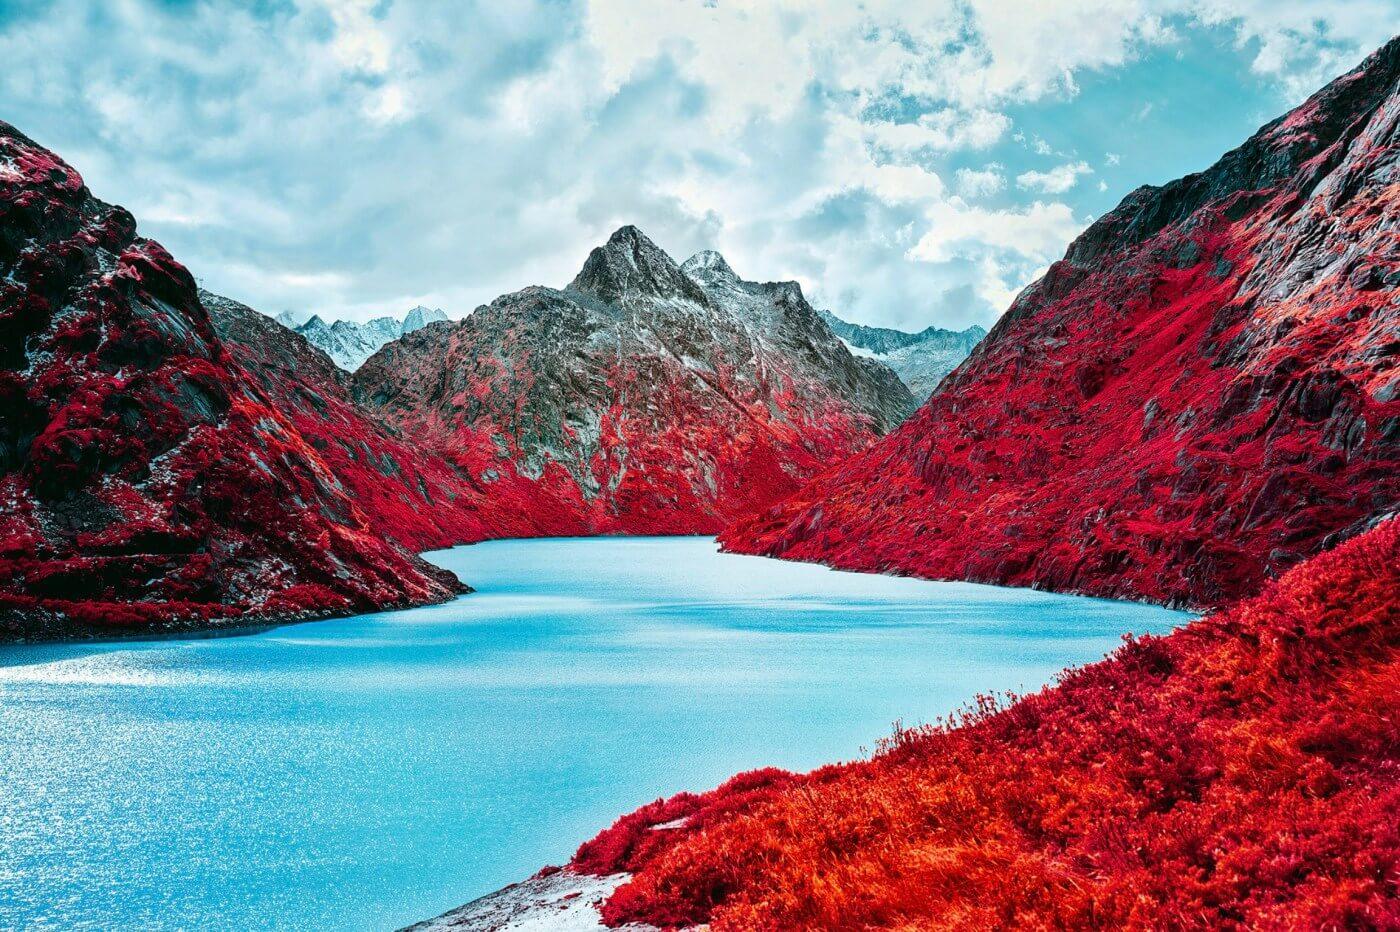 Swiss Alps - Infrared Moss and Fog by Zak van Biljon